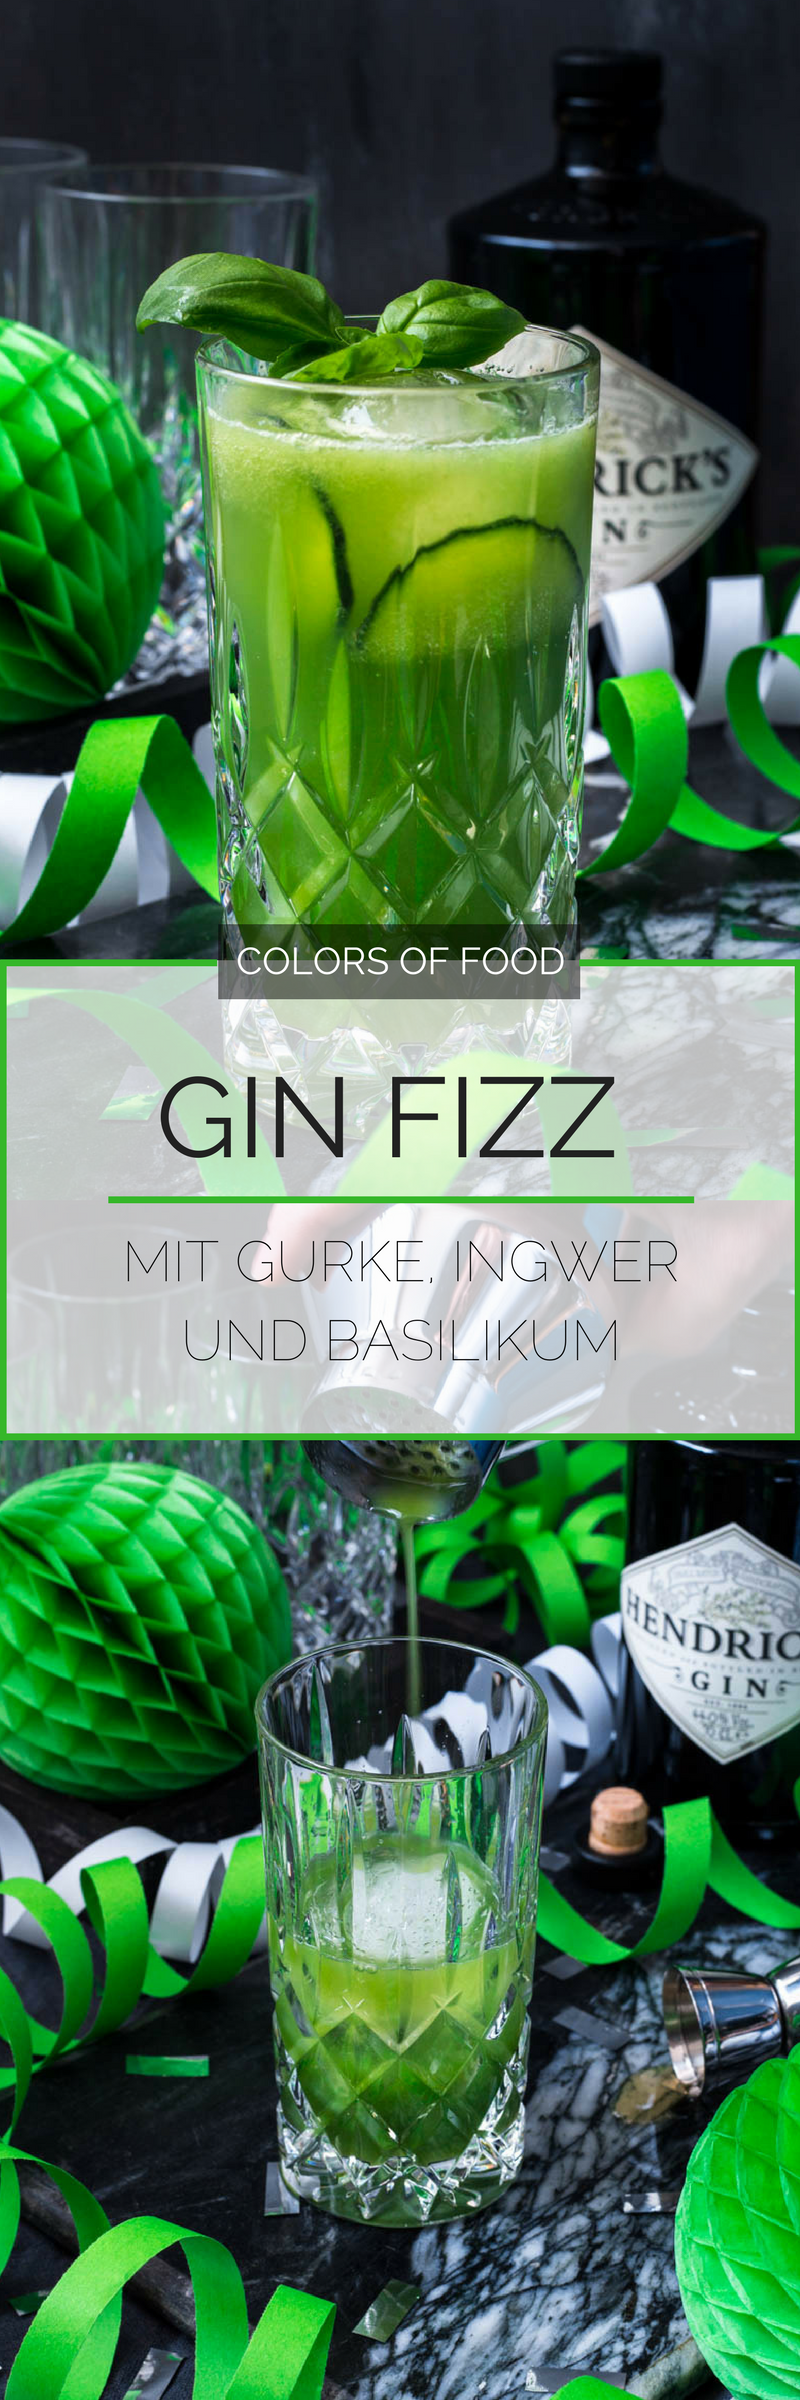 gin fizz mit gurke ingwer und basilikum rezept food. Black Bedroom Furniture Sets. Home Design Ideas